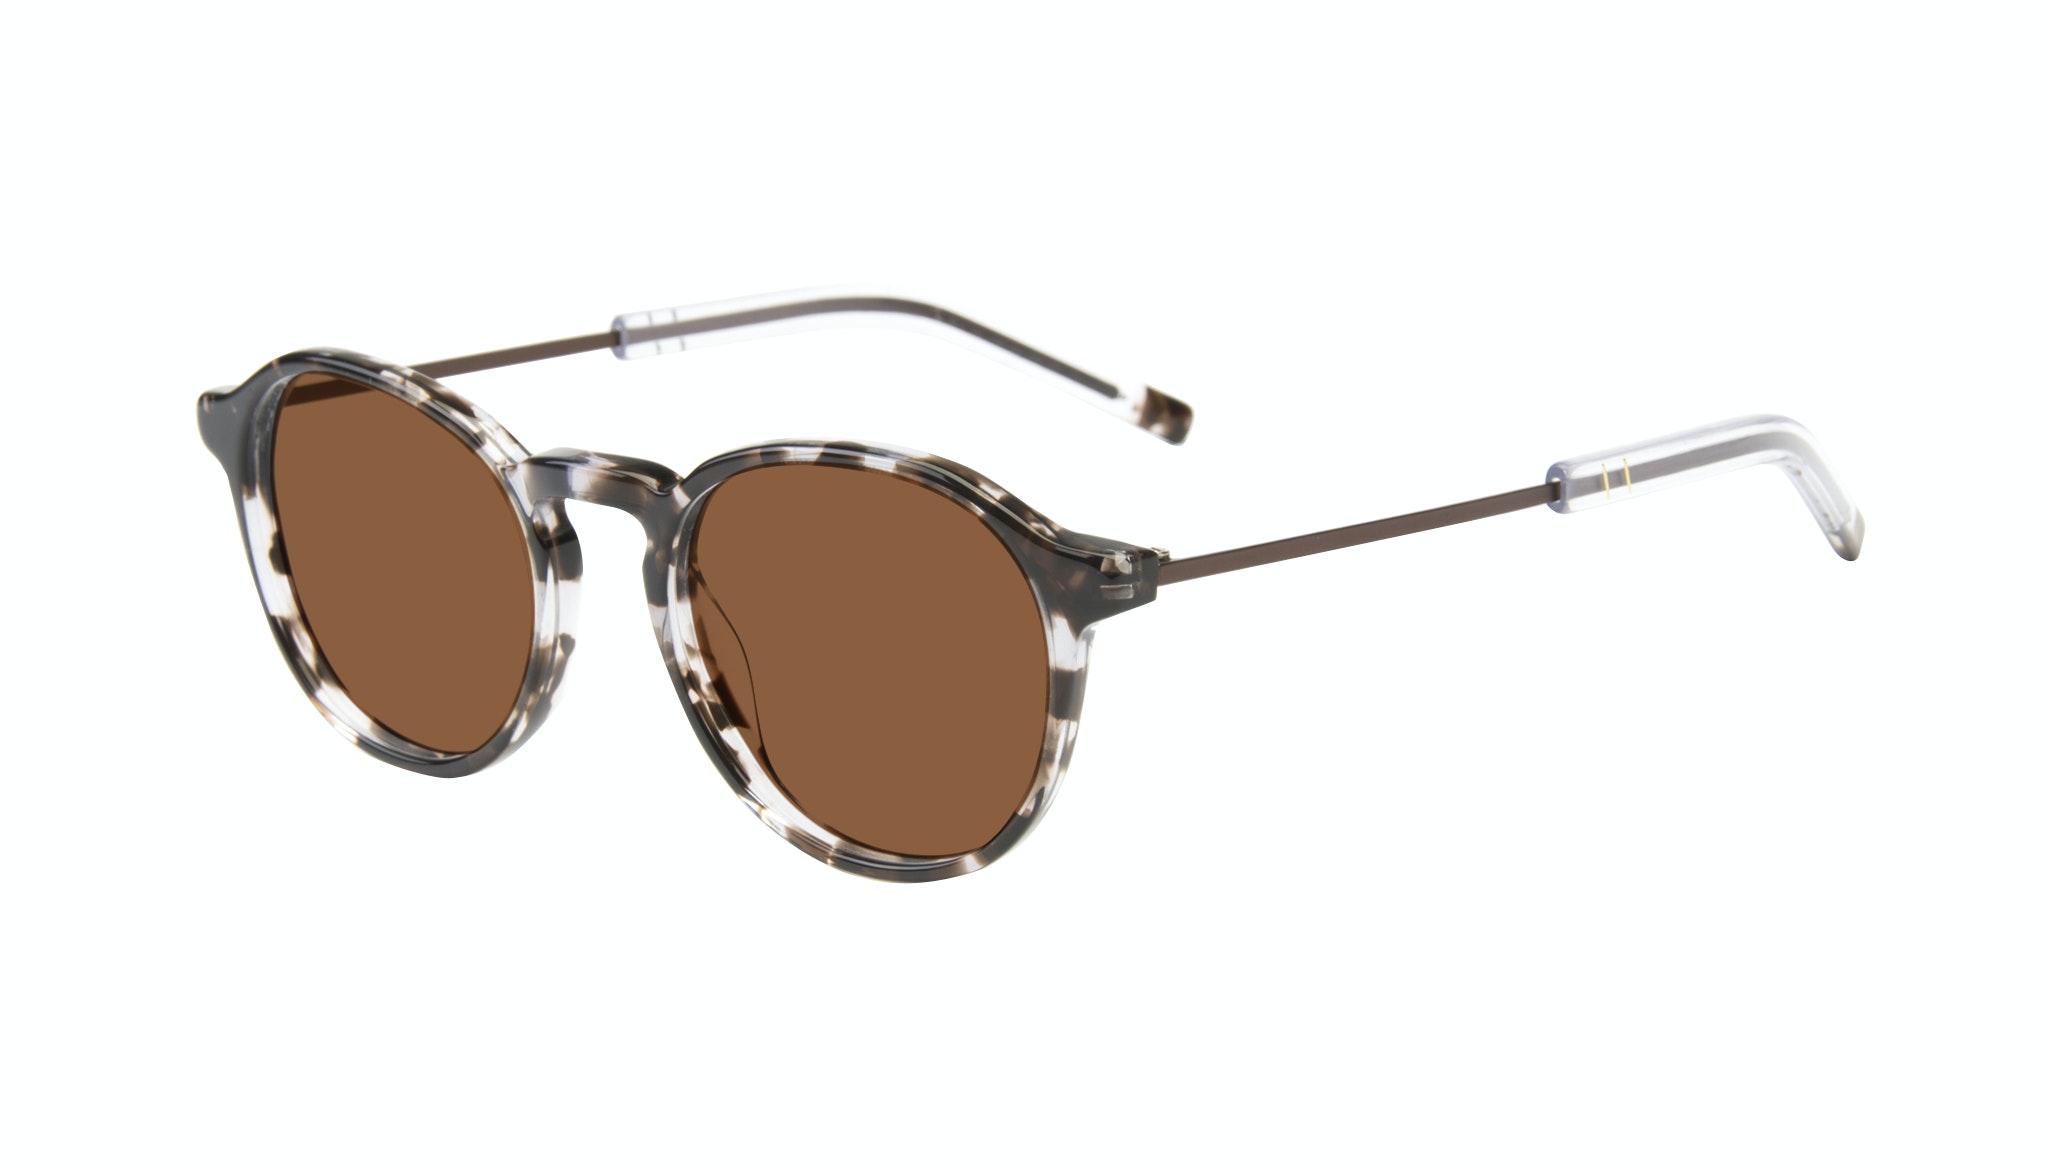 Affordable Fashion Glasses Round Sunglasses Men Prime Mud Tort Tilt